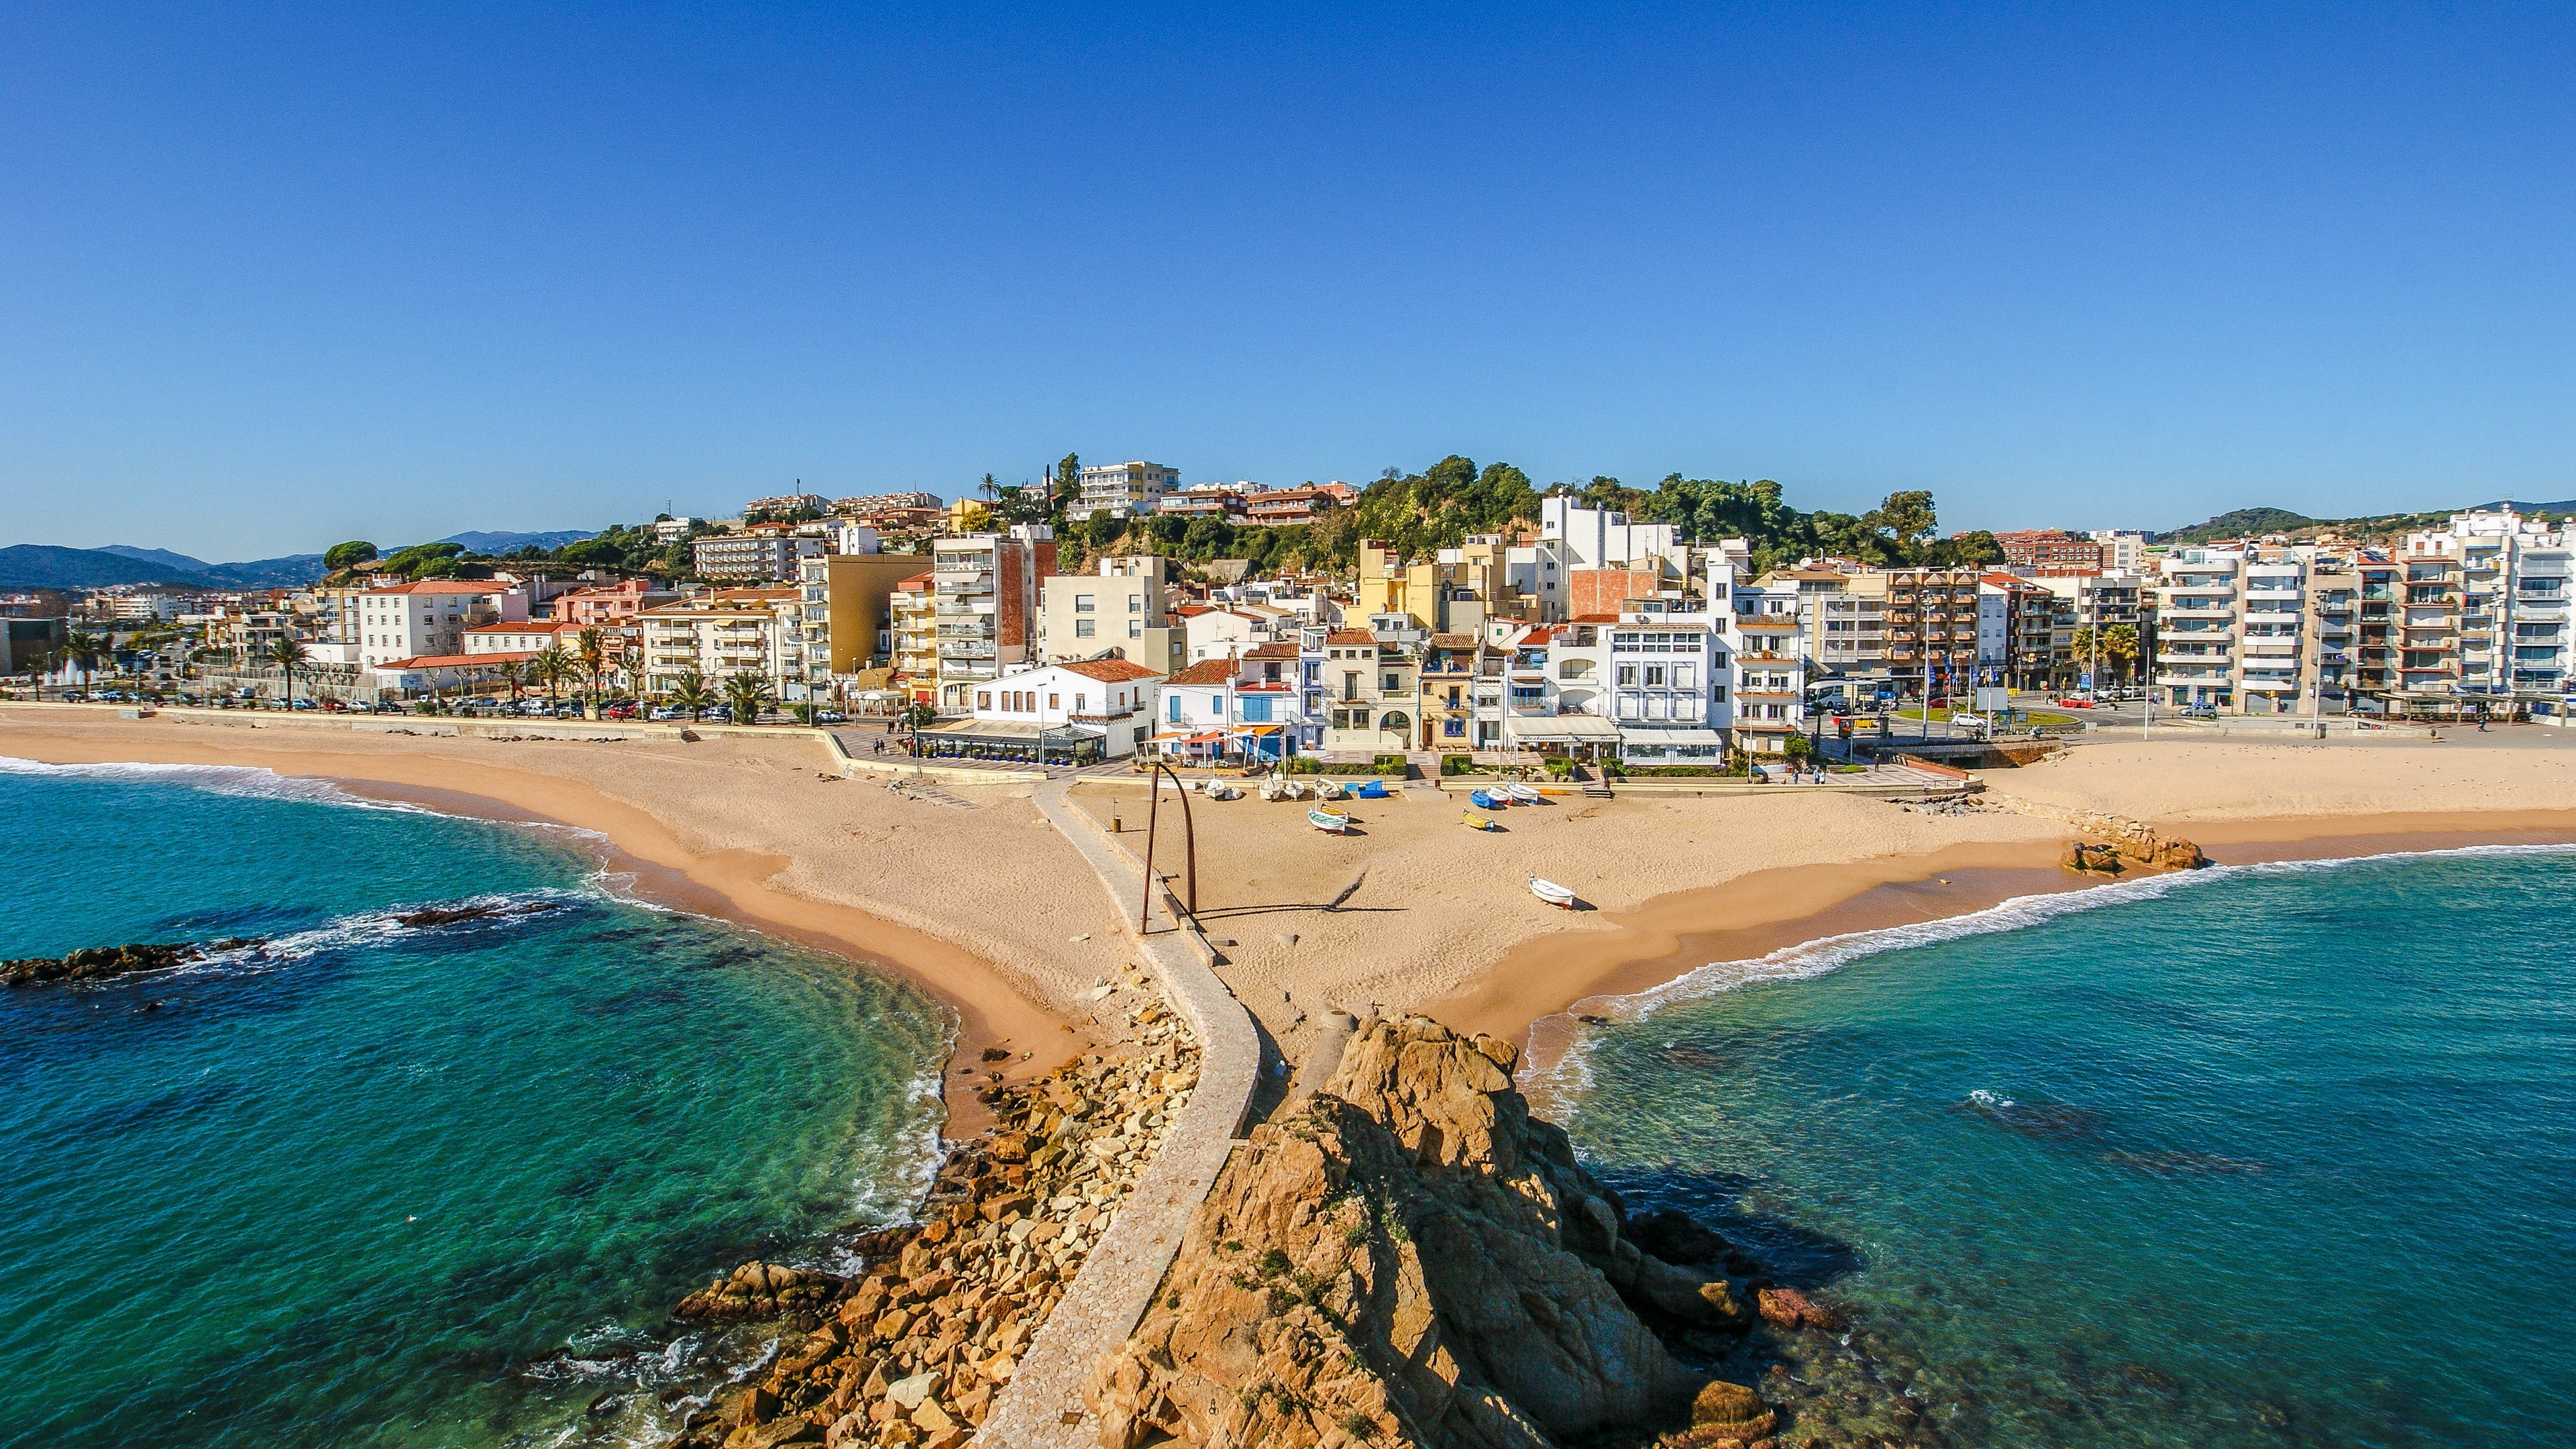 catalonia resort beach 4k 1541116100 - catalonia, resort, beach 4k - Resort, catalonia, Beach